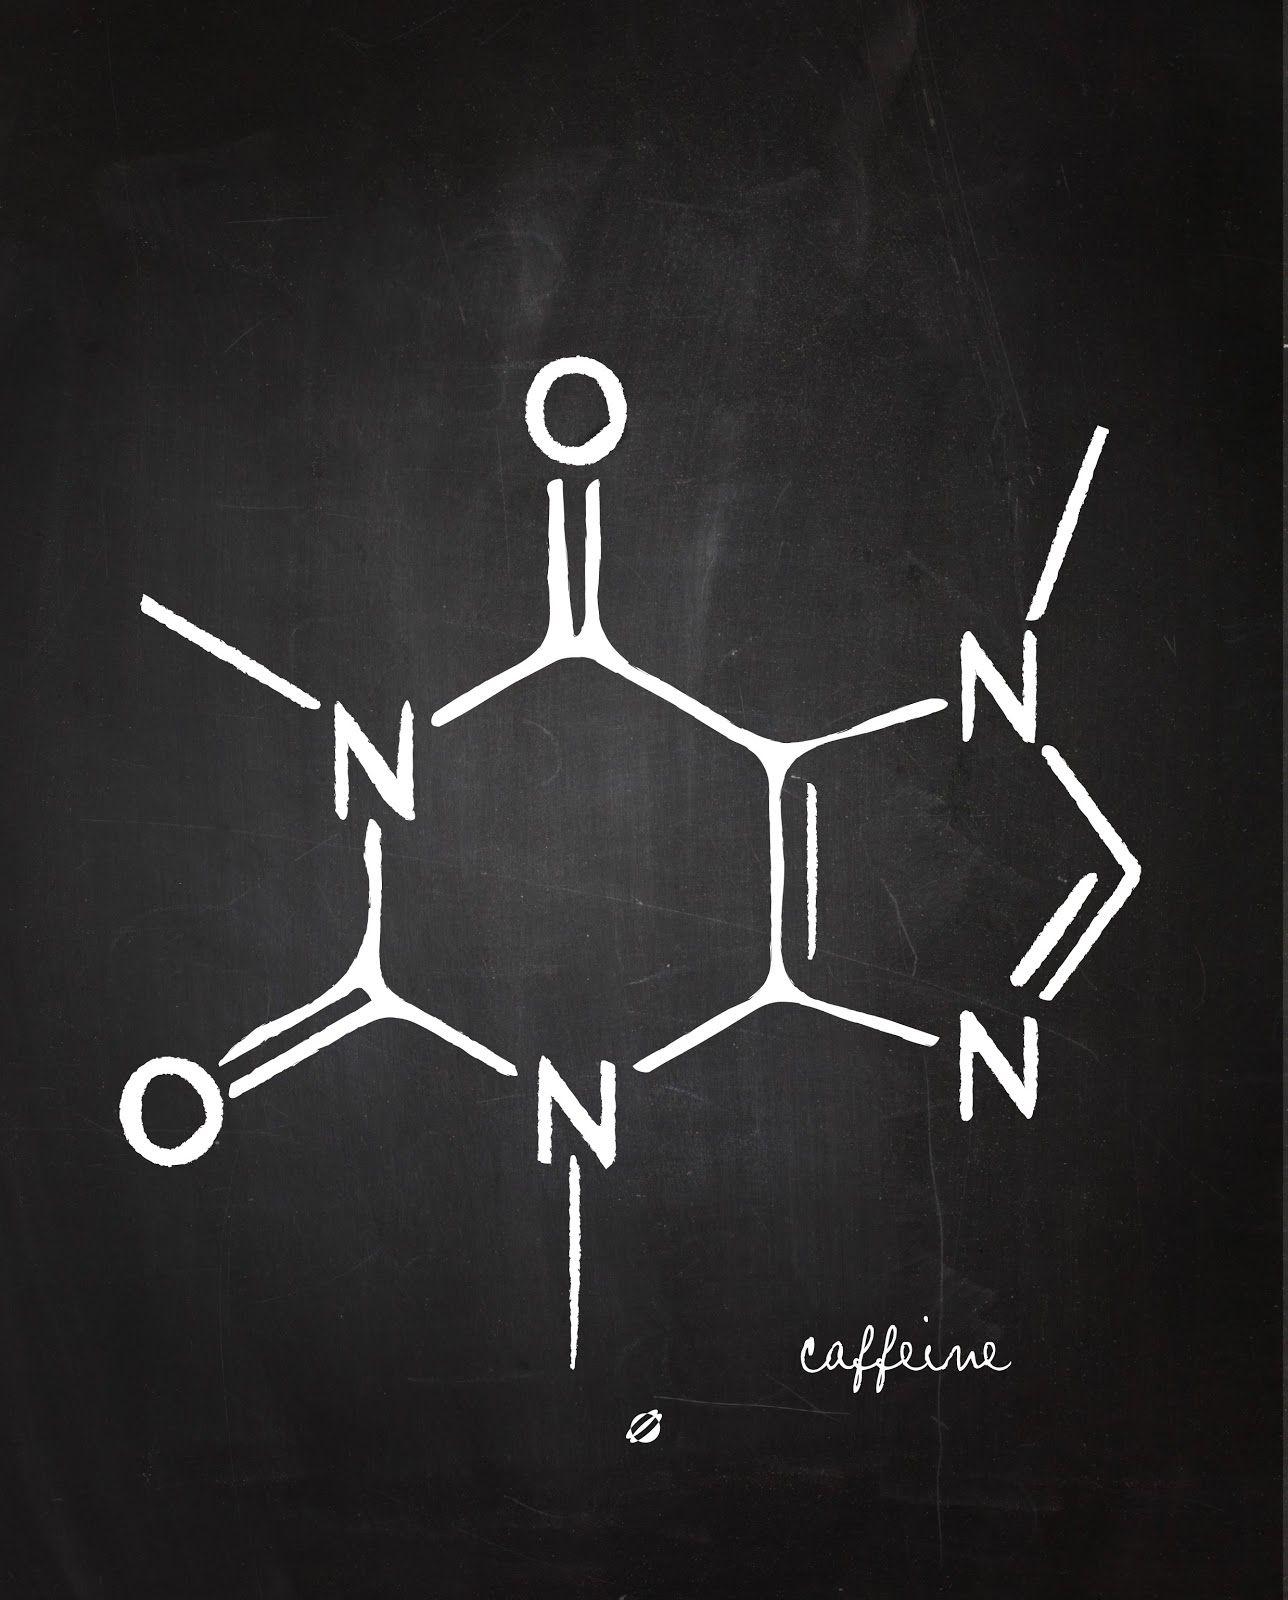 medium resolution of lostbumblebee 2014 caffeine chemistry 101 free printable plant science food science science humor